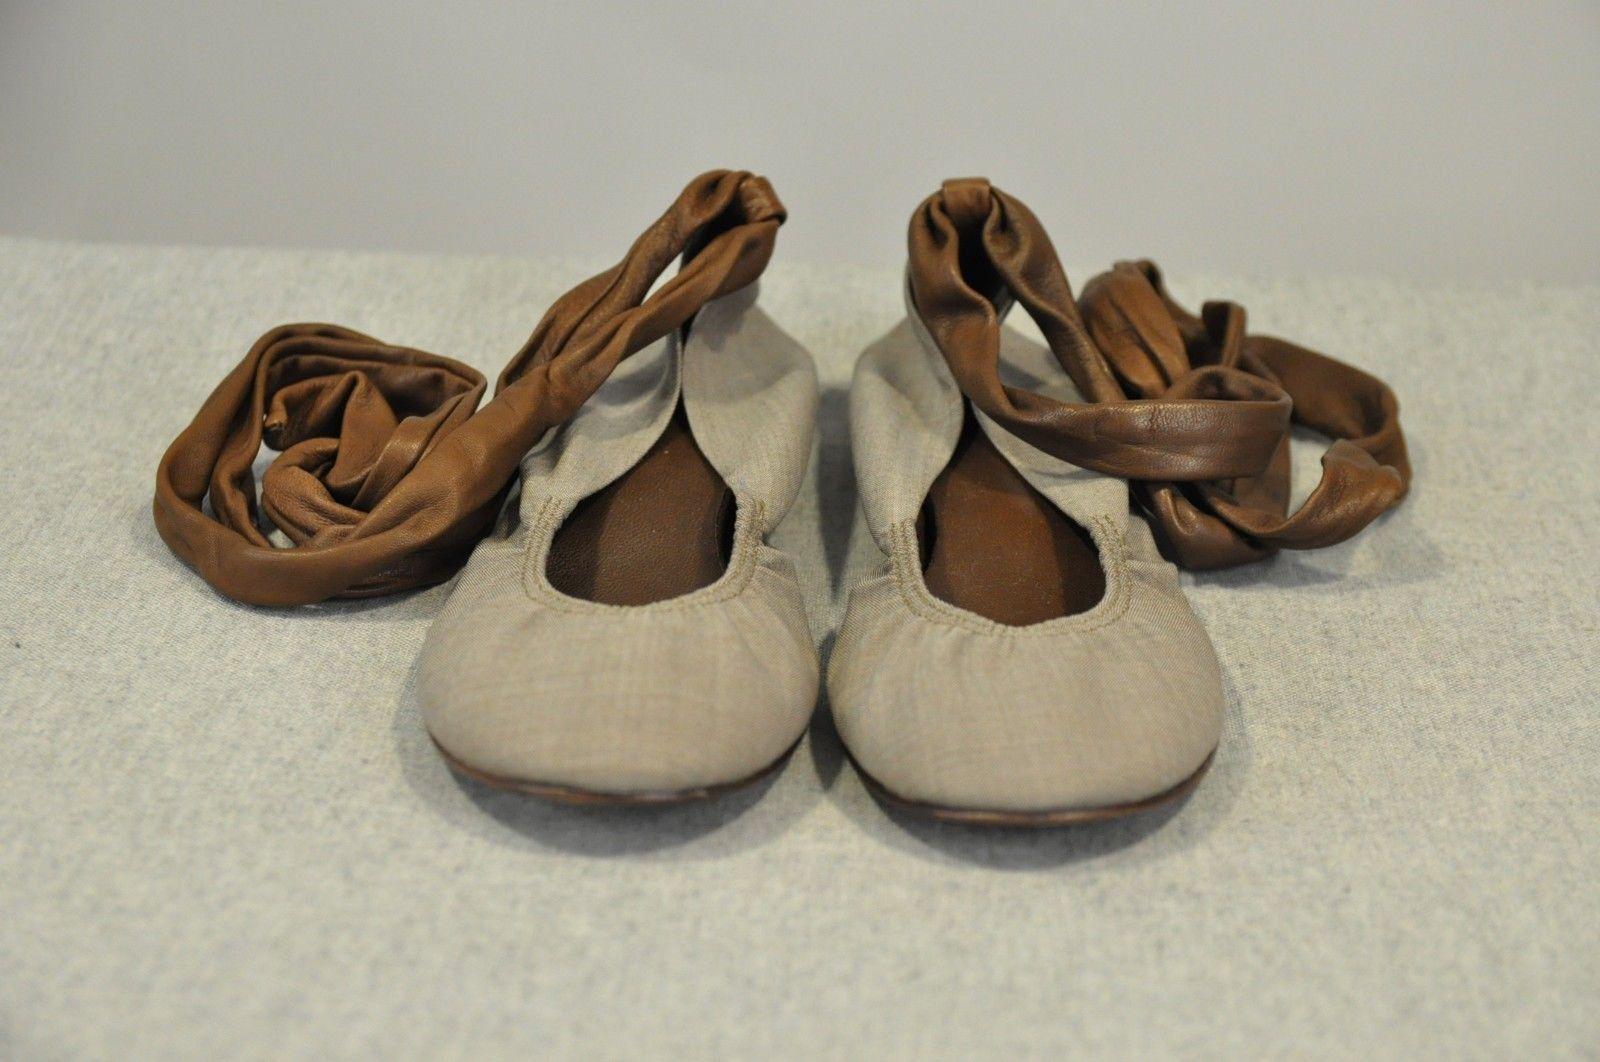 .NWB 565 Brunello Cucinelli Gunex Womens Leather 2Tone Lace-Up Ballet Flat shoes